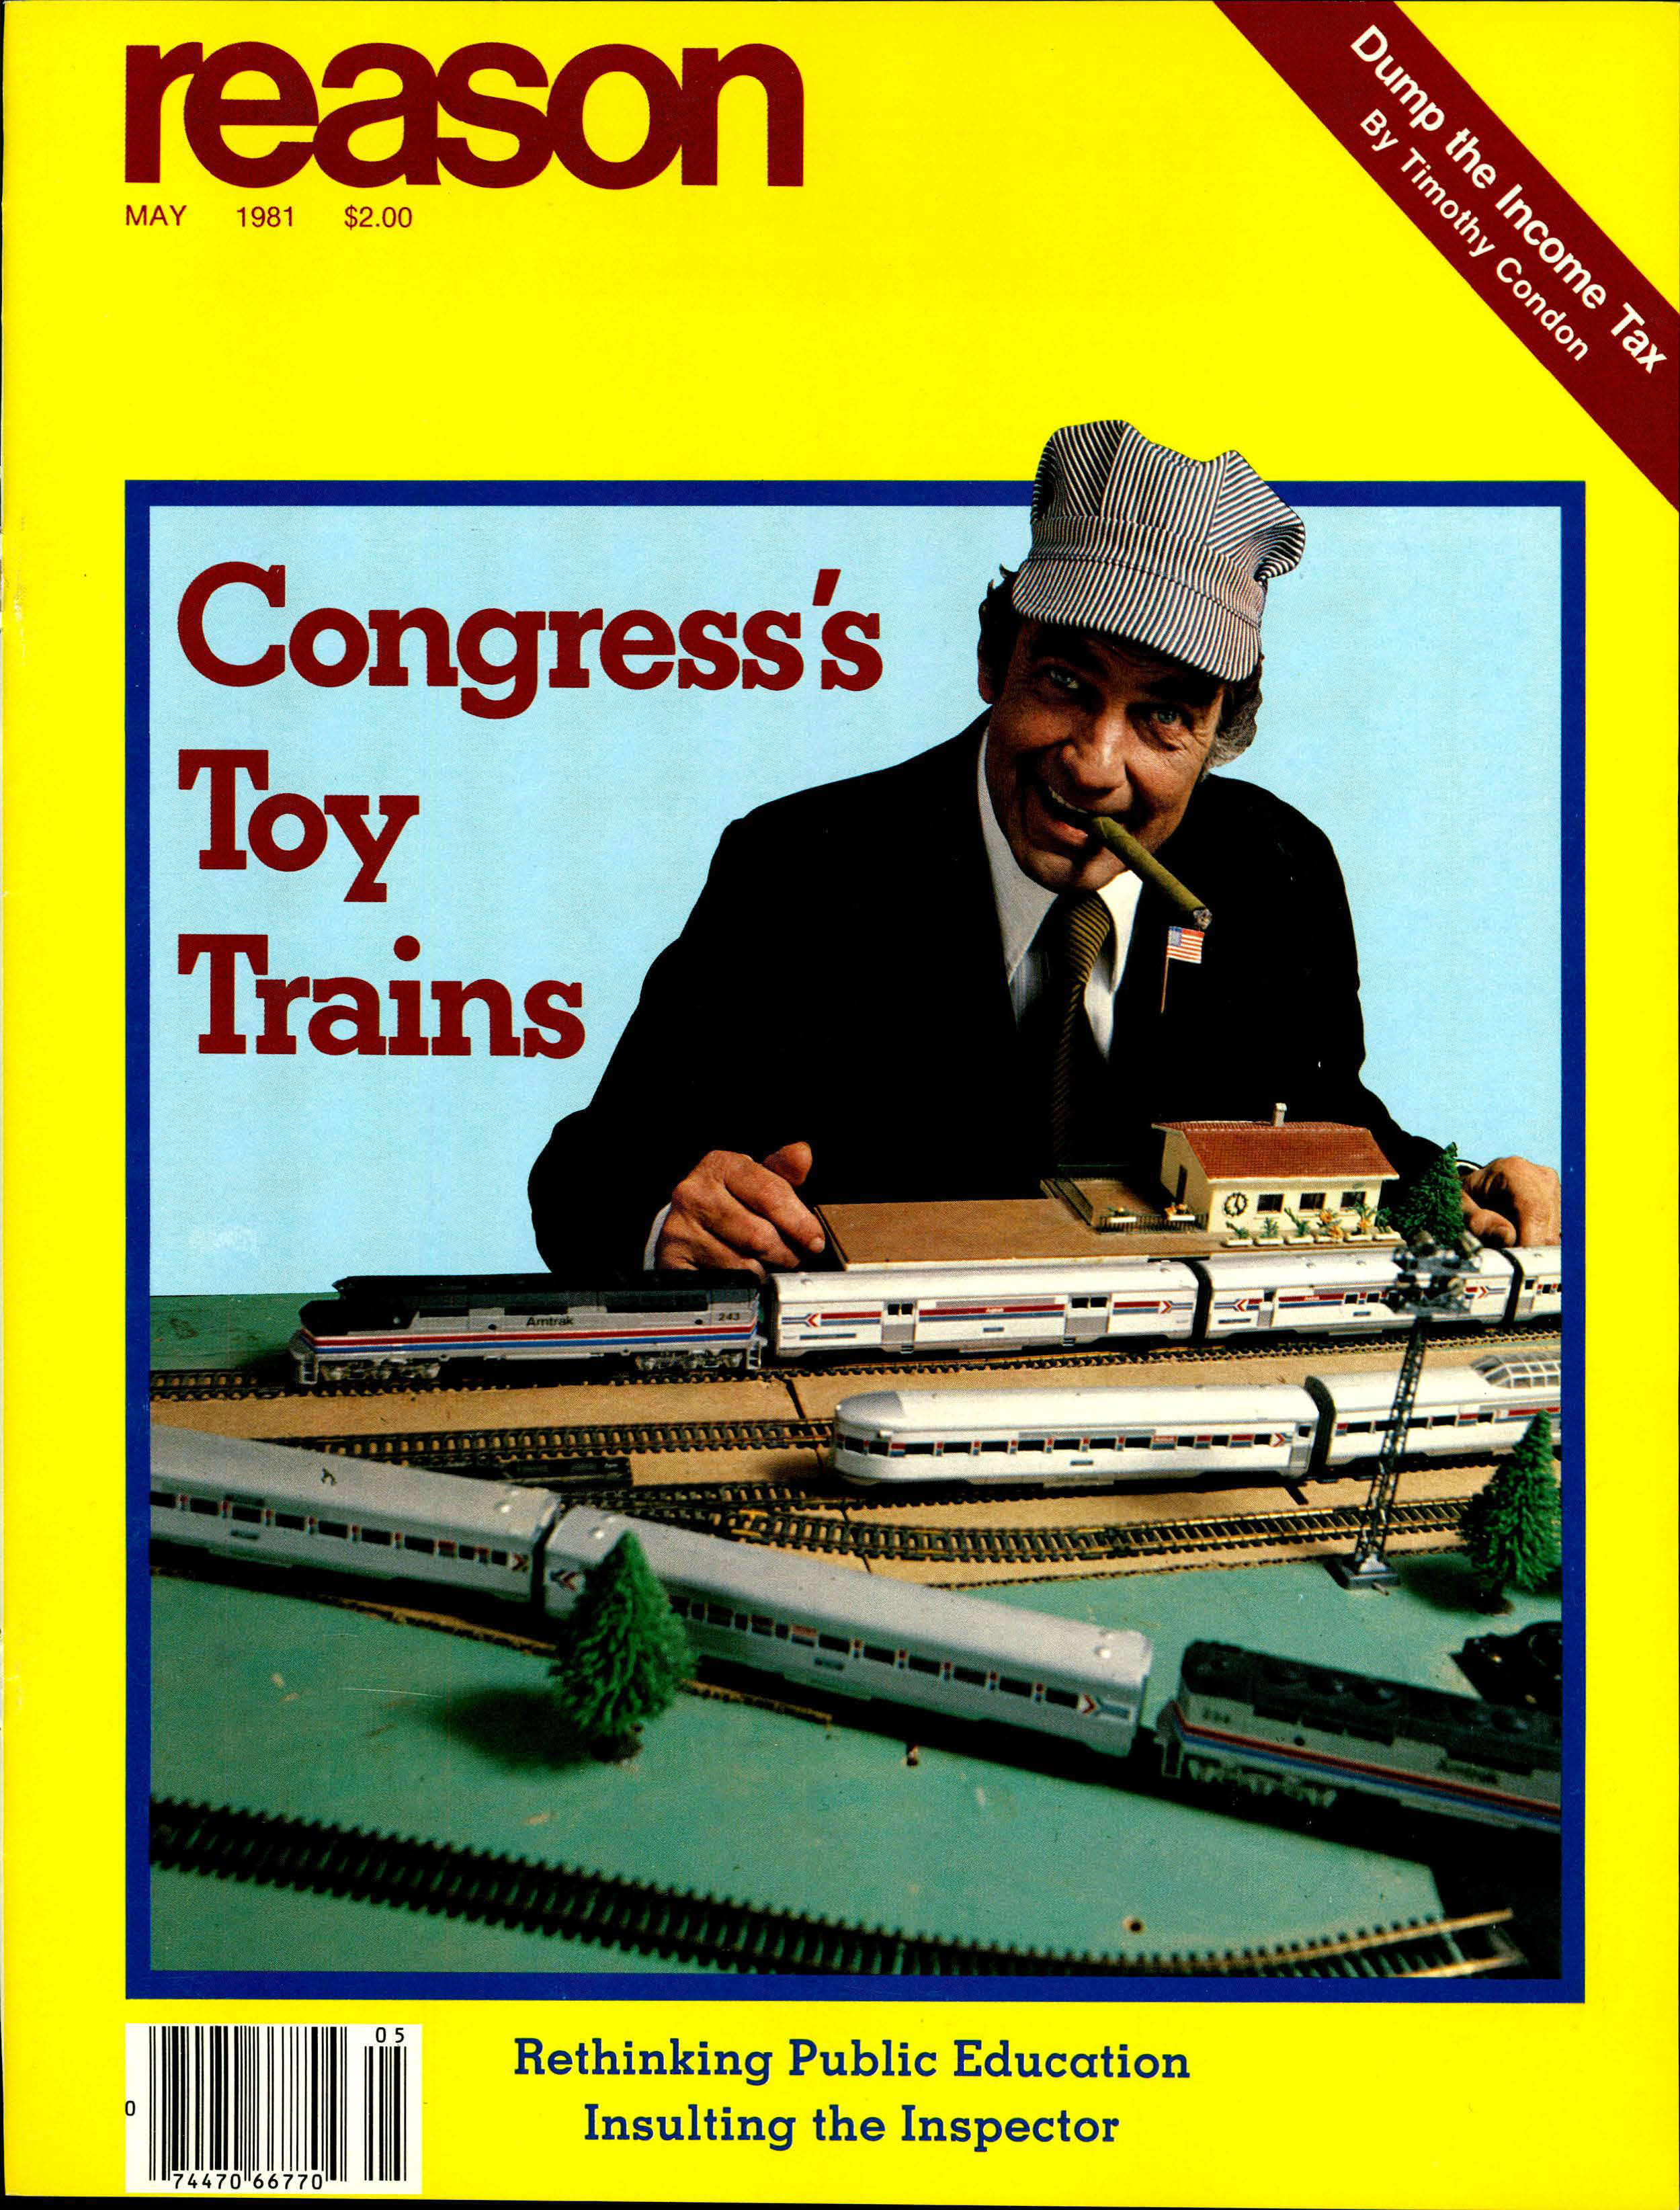 Reason Magazine, May 1981 cover image